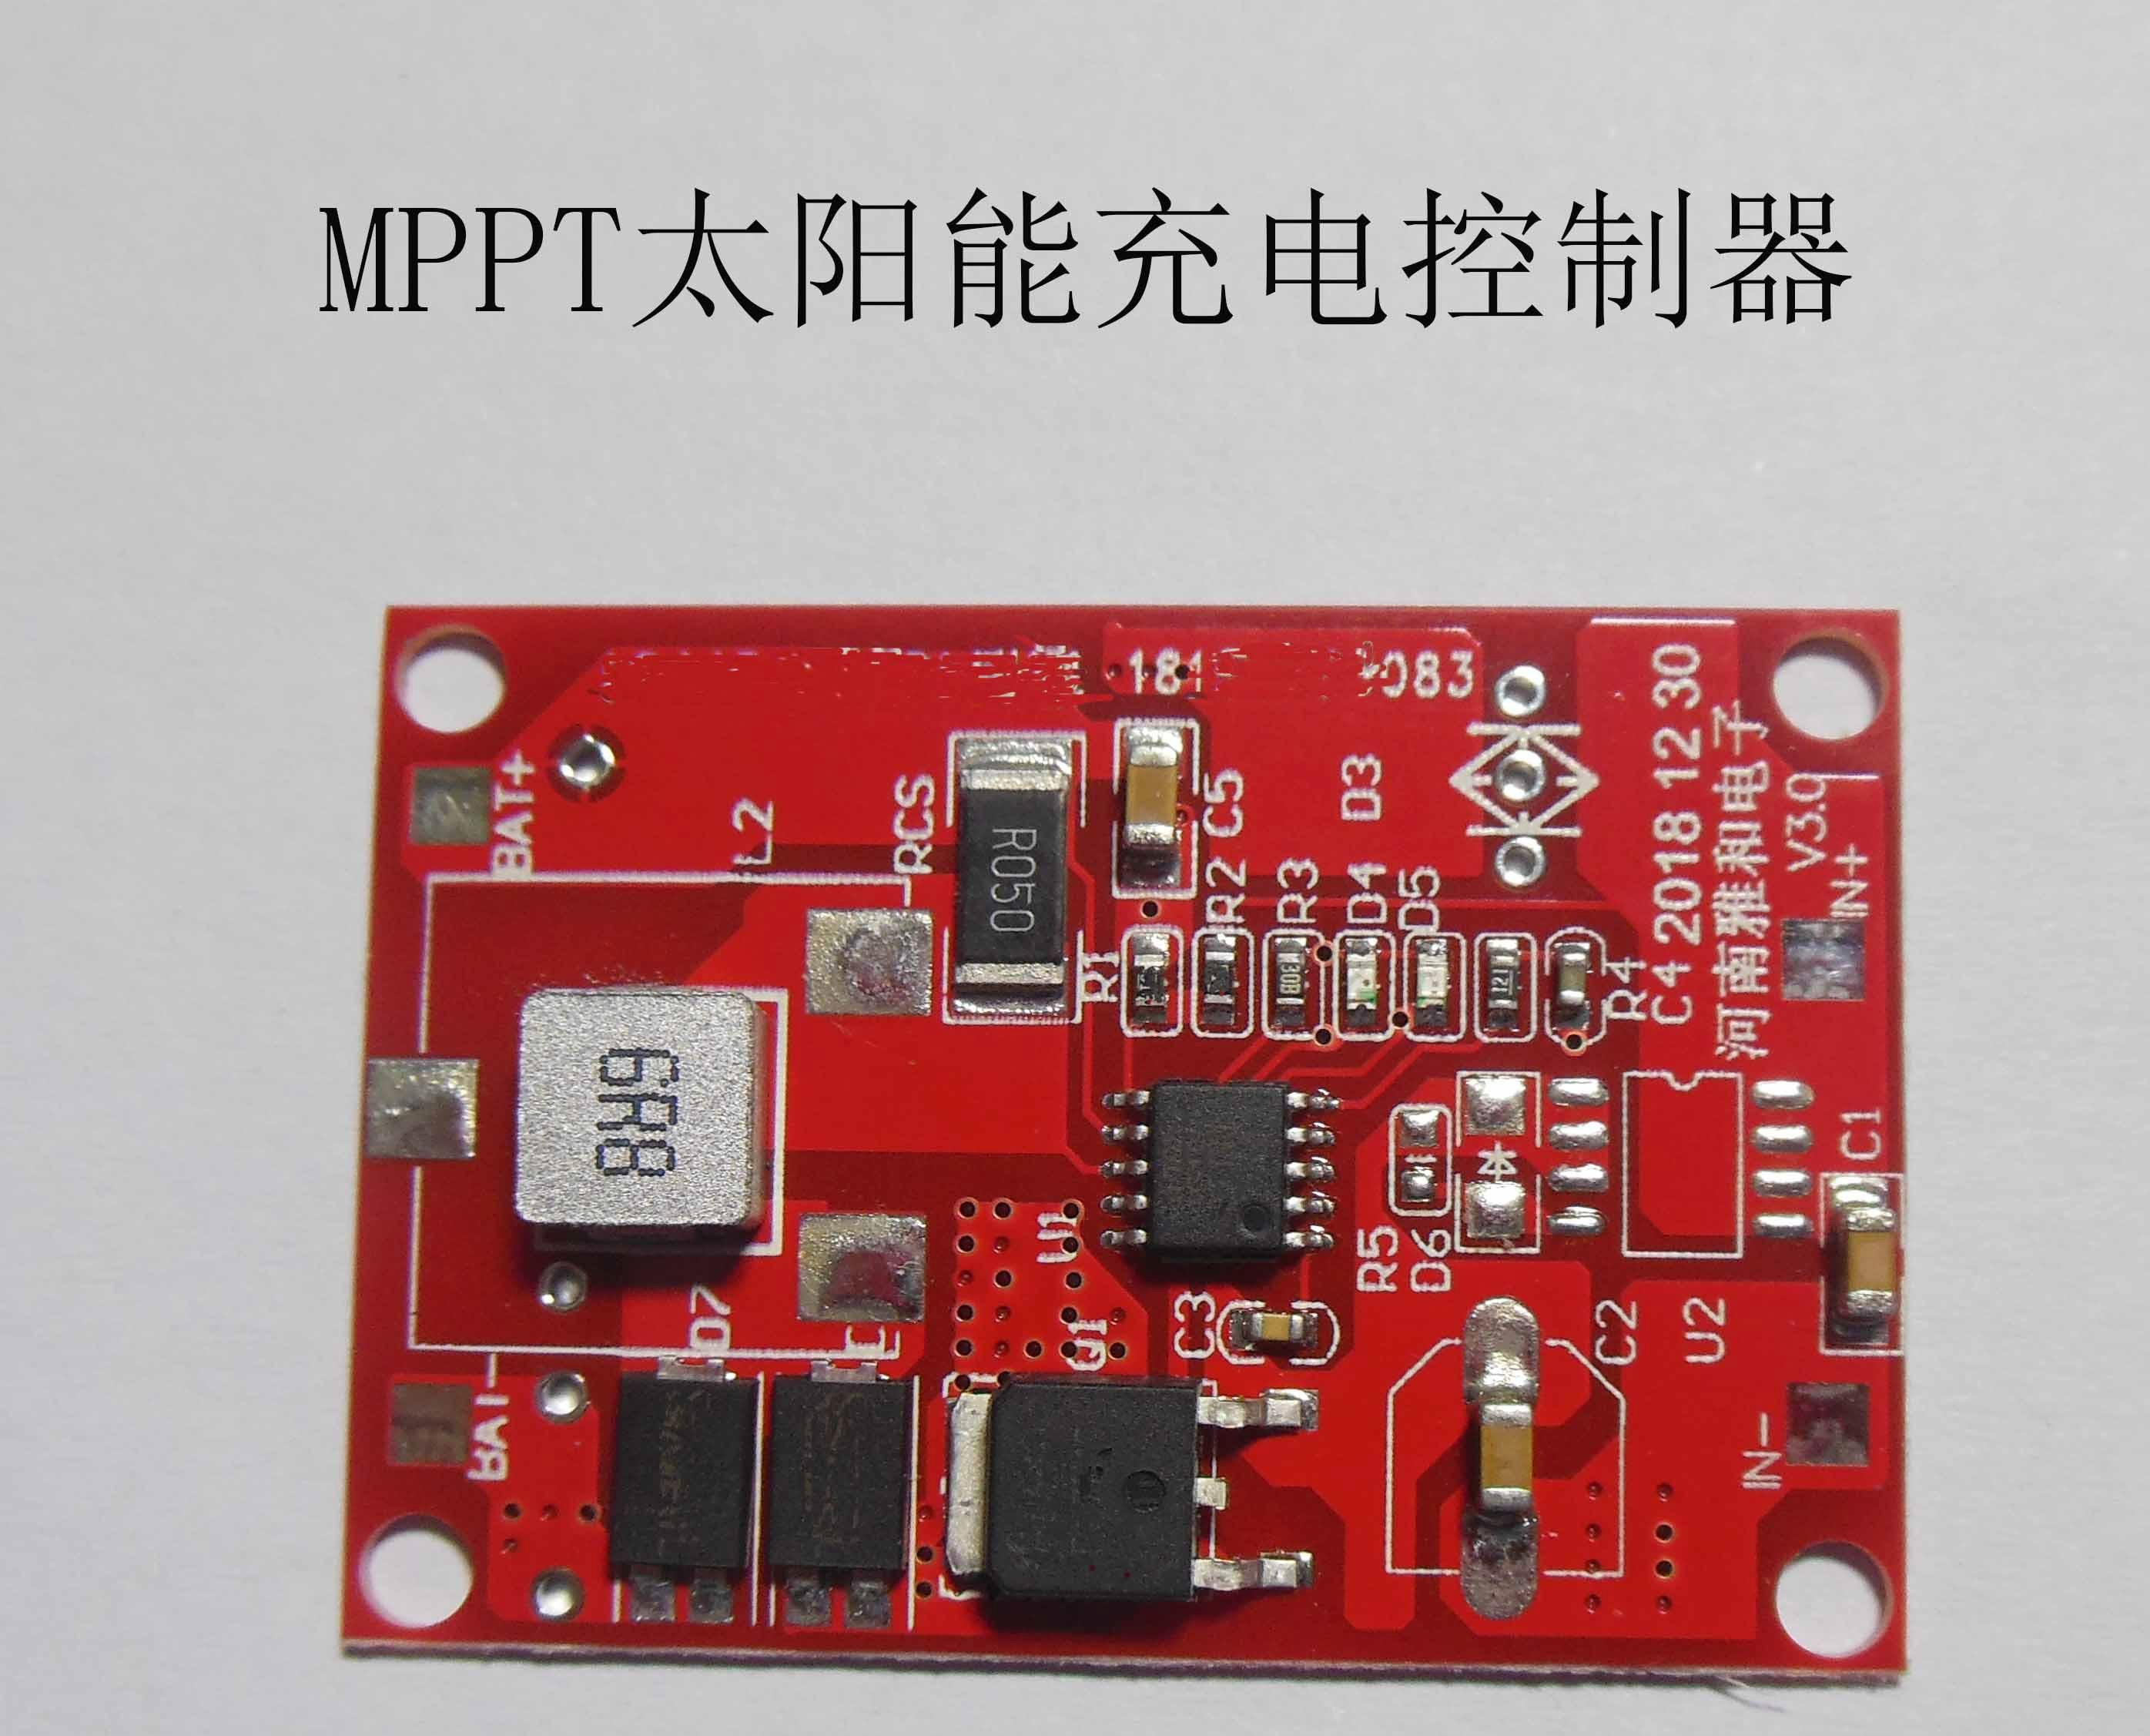 MPPT Solar Panel Charging Controller MPPT Charging Controller 3.2v Lithium Iron Phosphate Charging